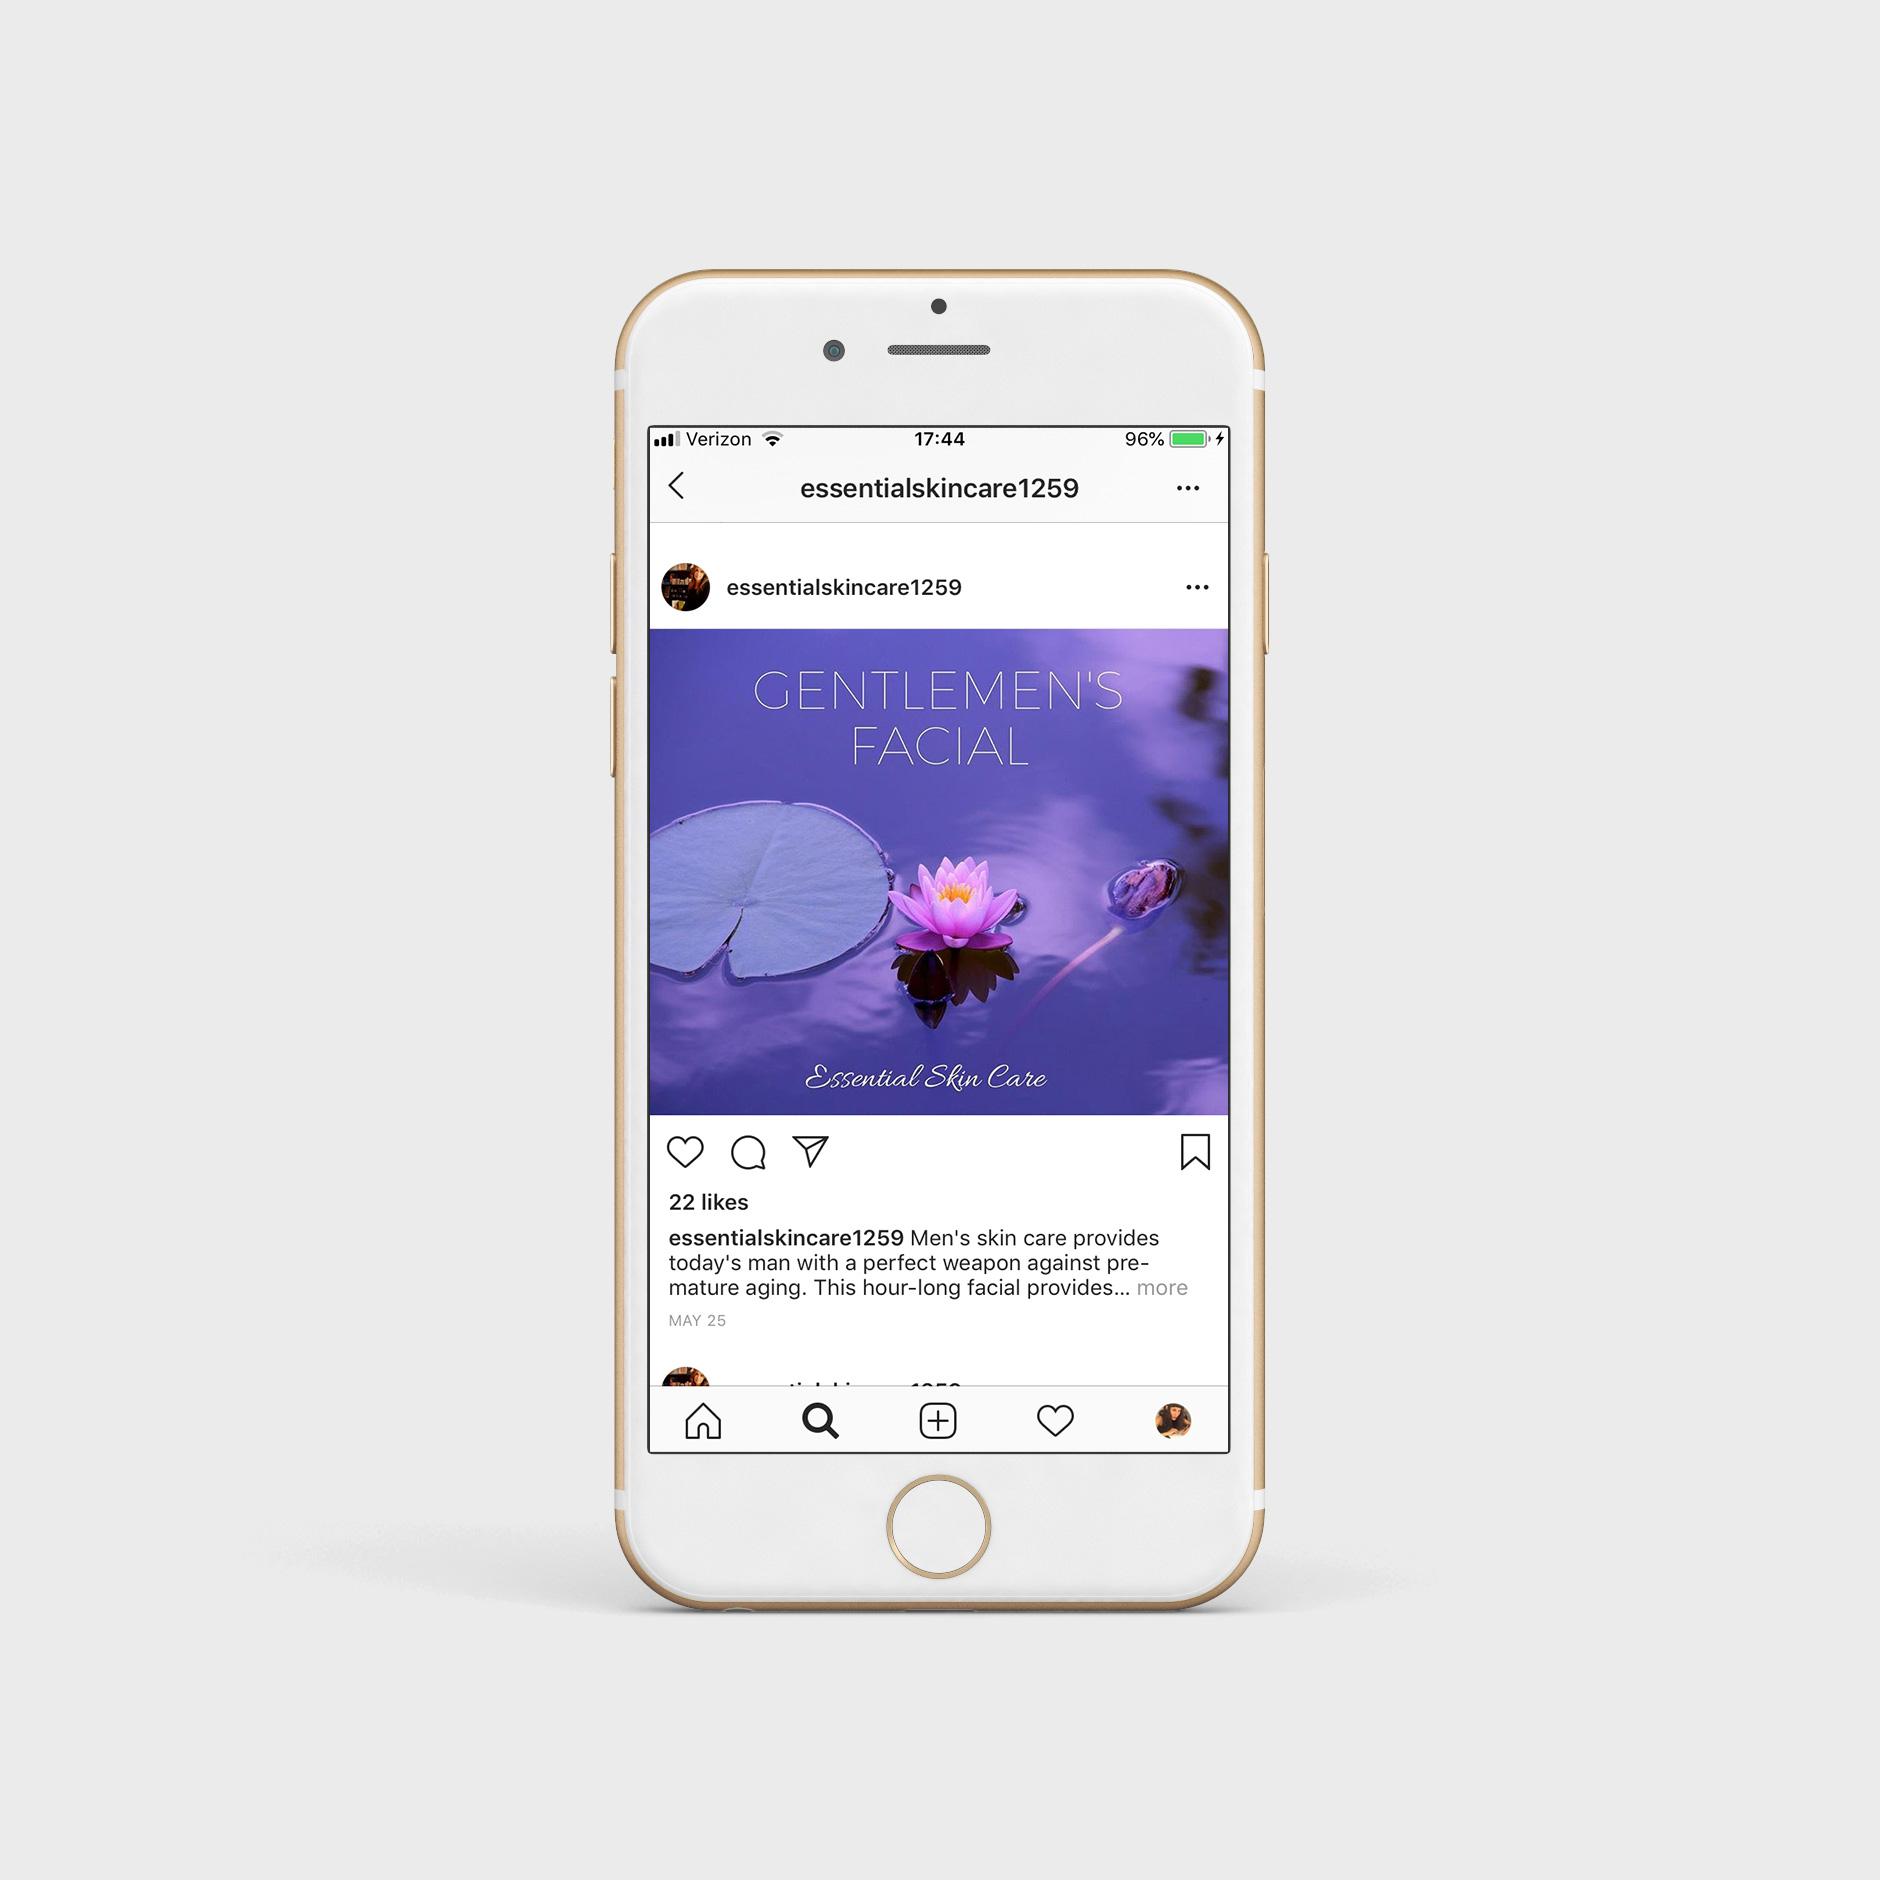 branded social media post